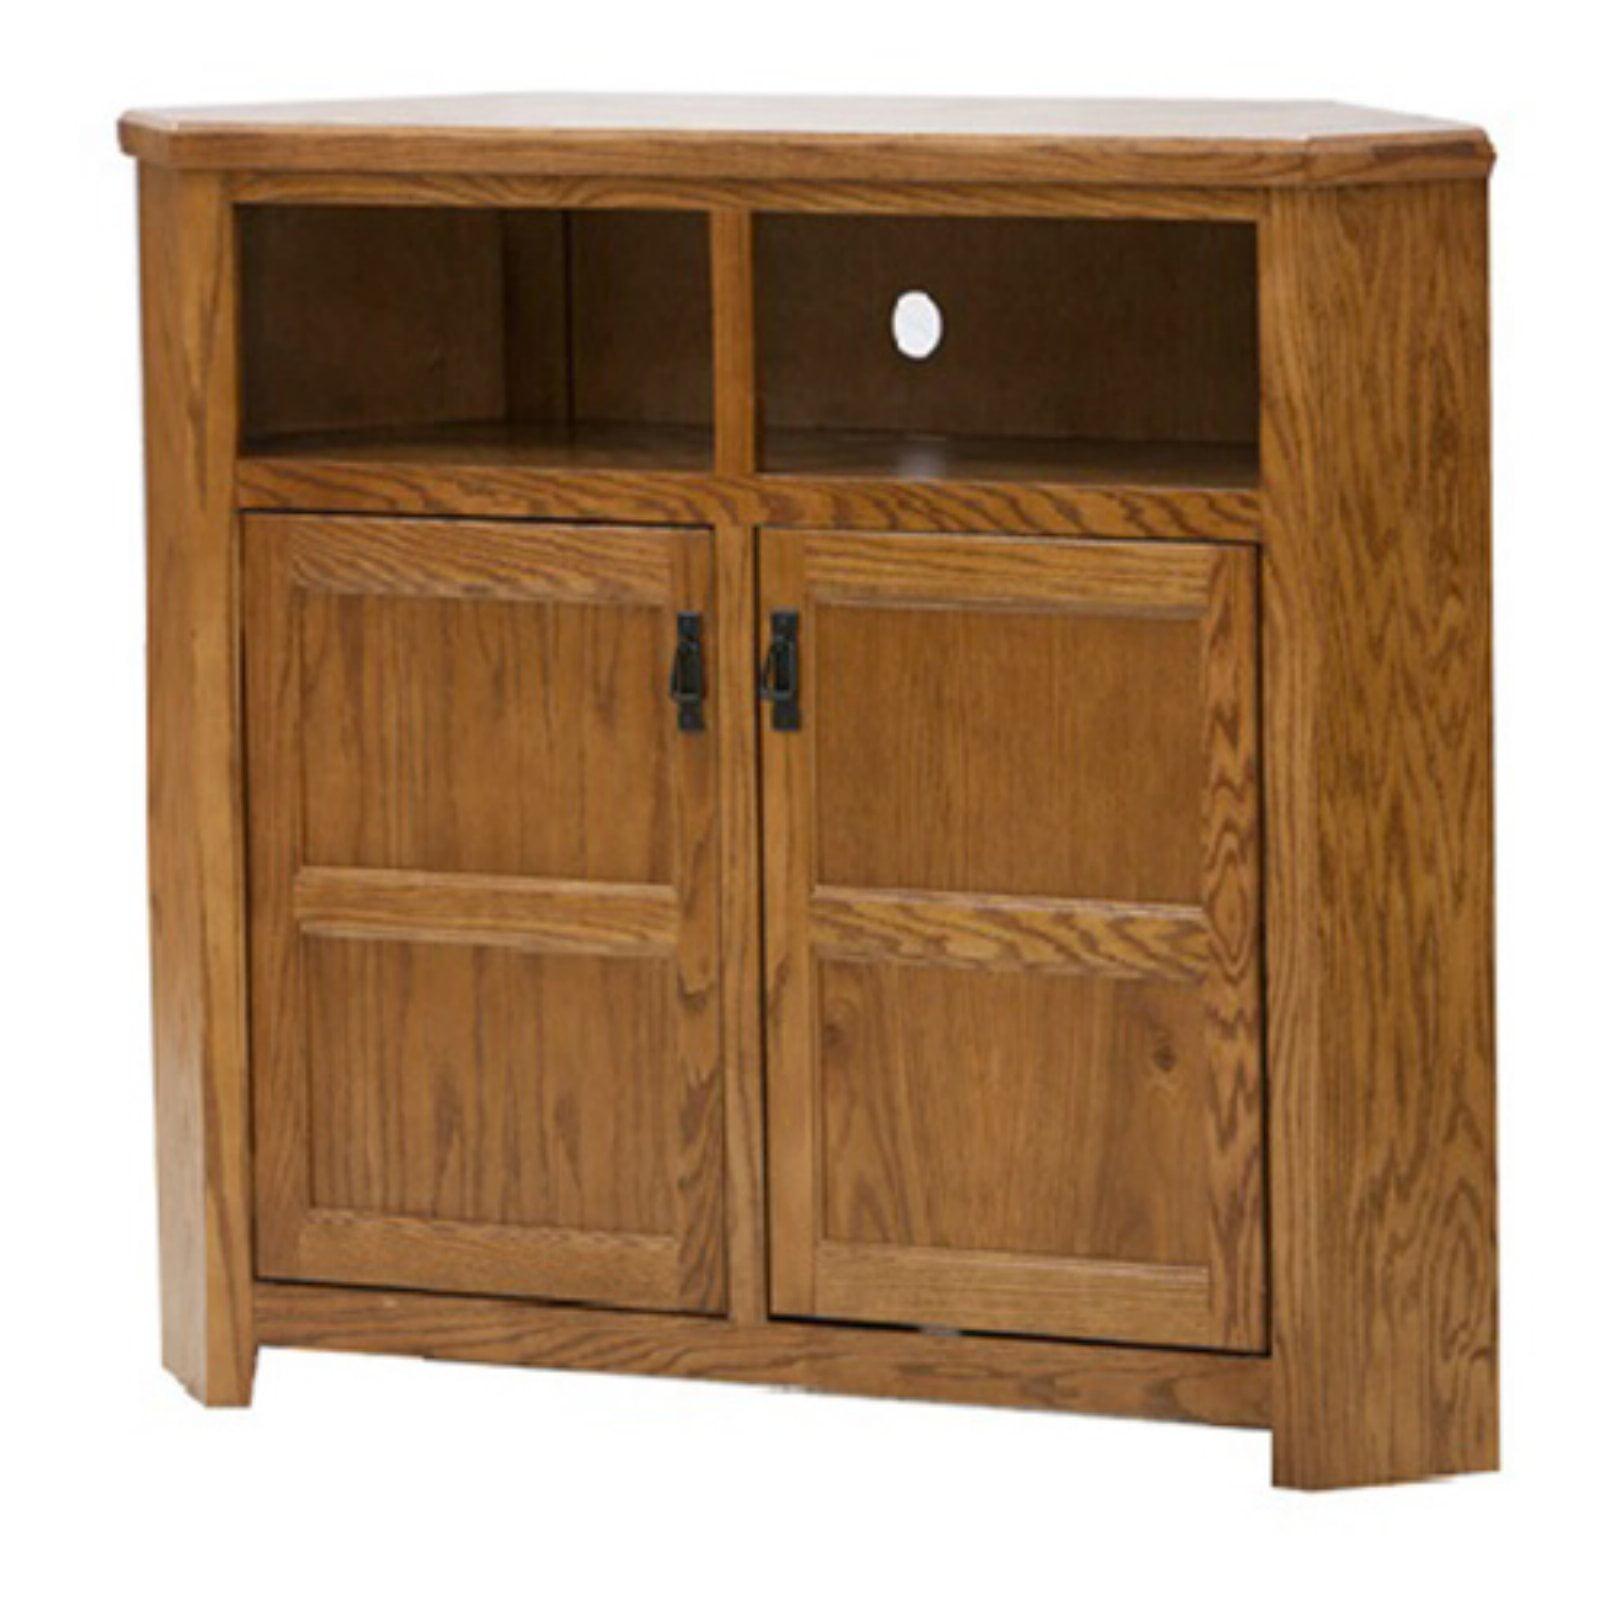 Eagle Furniture Mission 50 in. Wide Corner TV Console